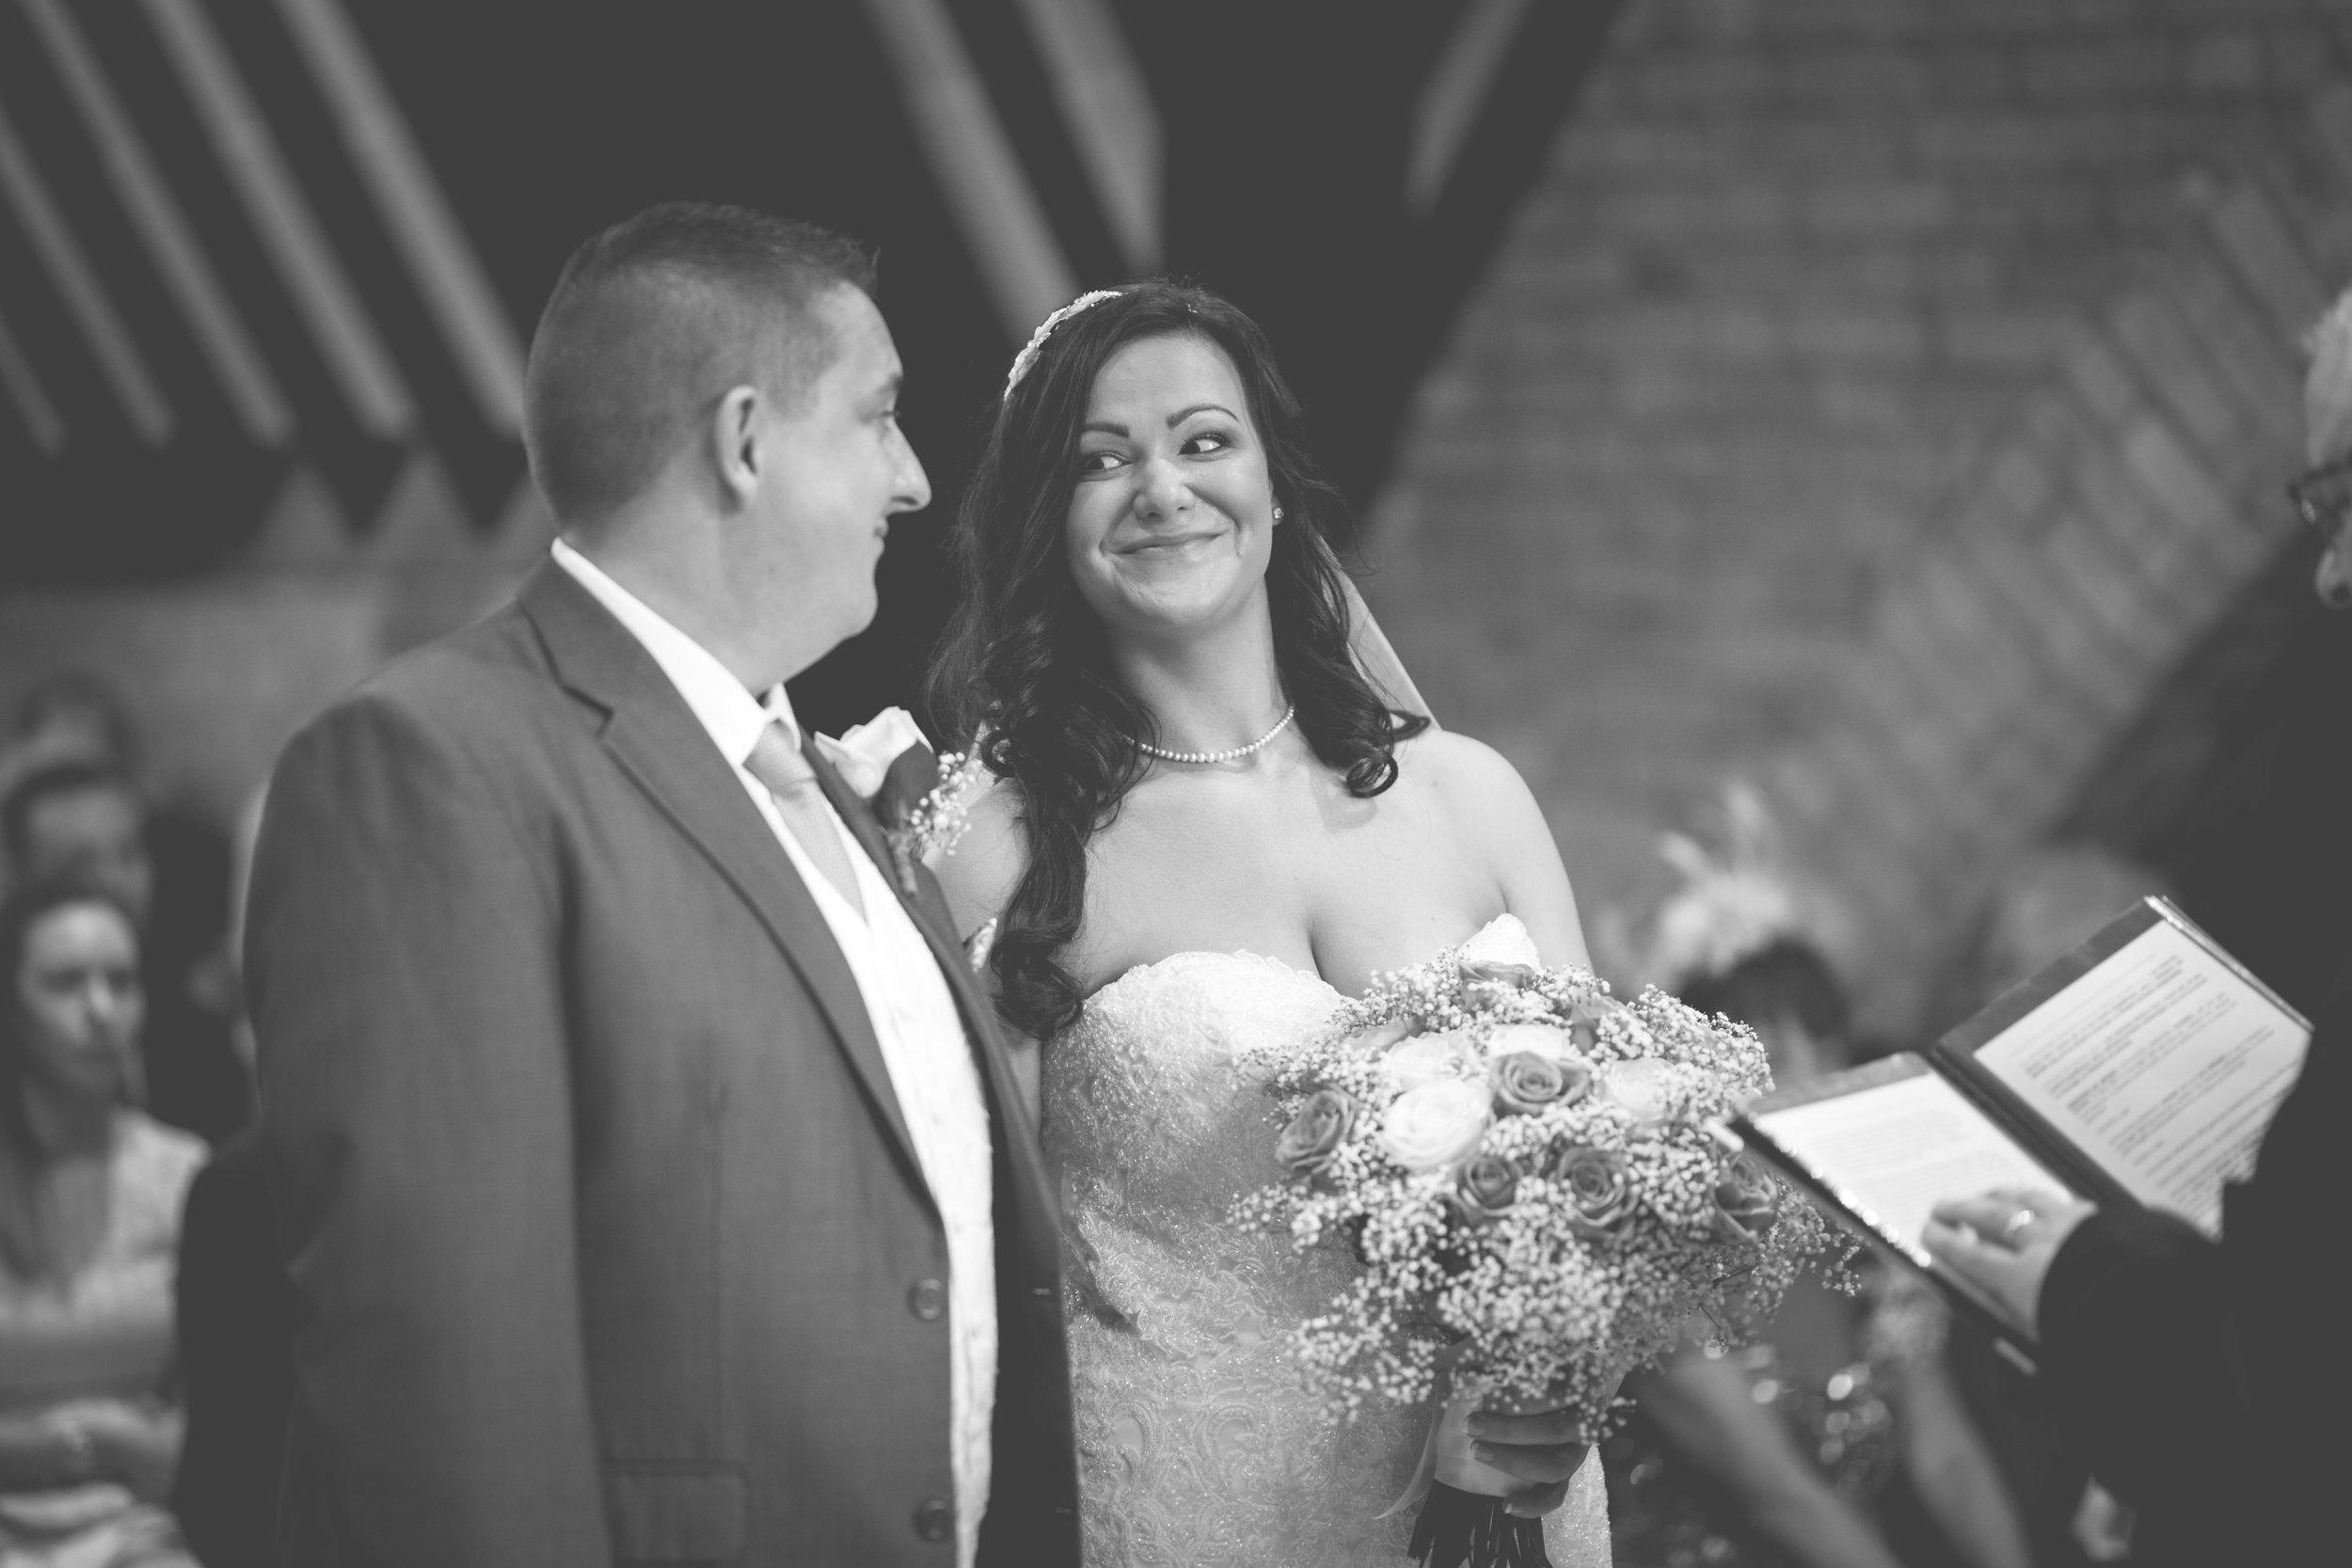 Helena & Terence - Ceremony-38.jpg